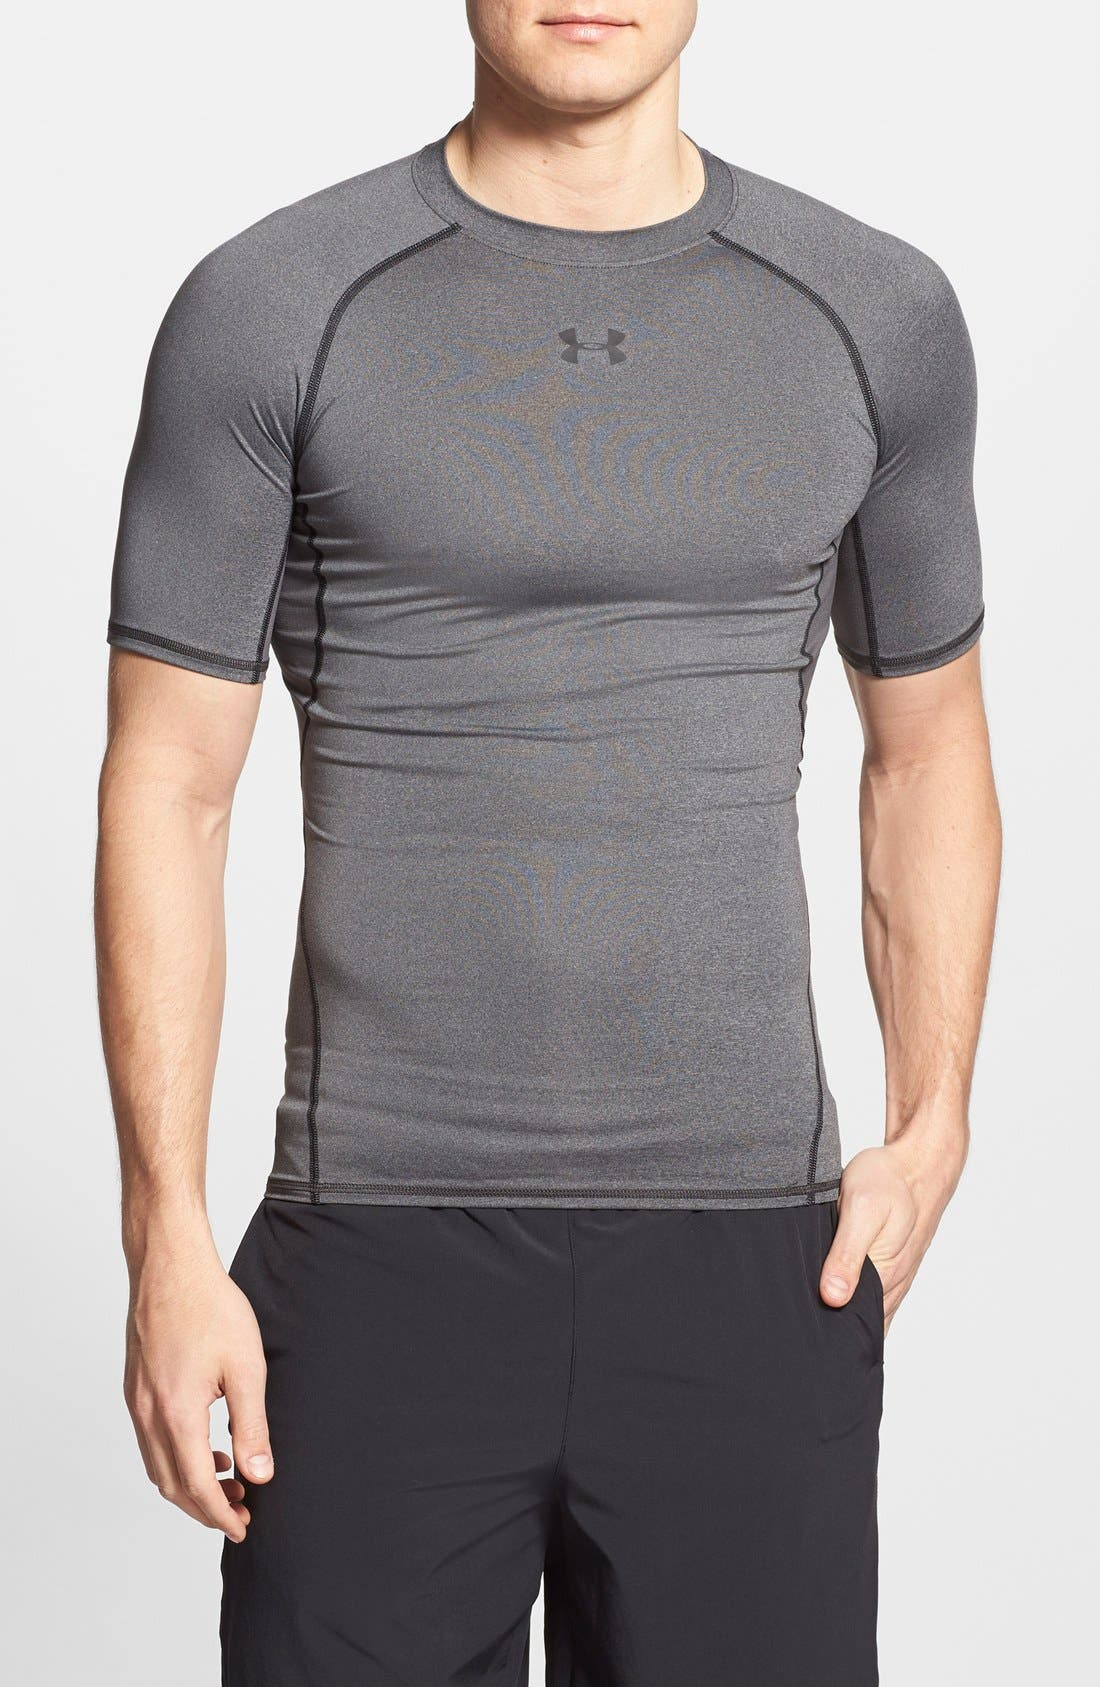 HeatGear<sup>®</sup> Compression Fit T-Shirt,                             Main thumbnail 1, color,                             CARBON HEATHER/ BLACK